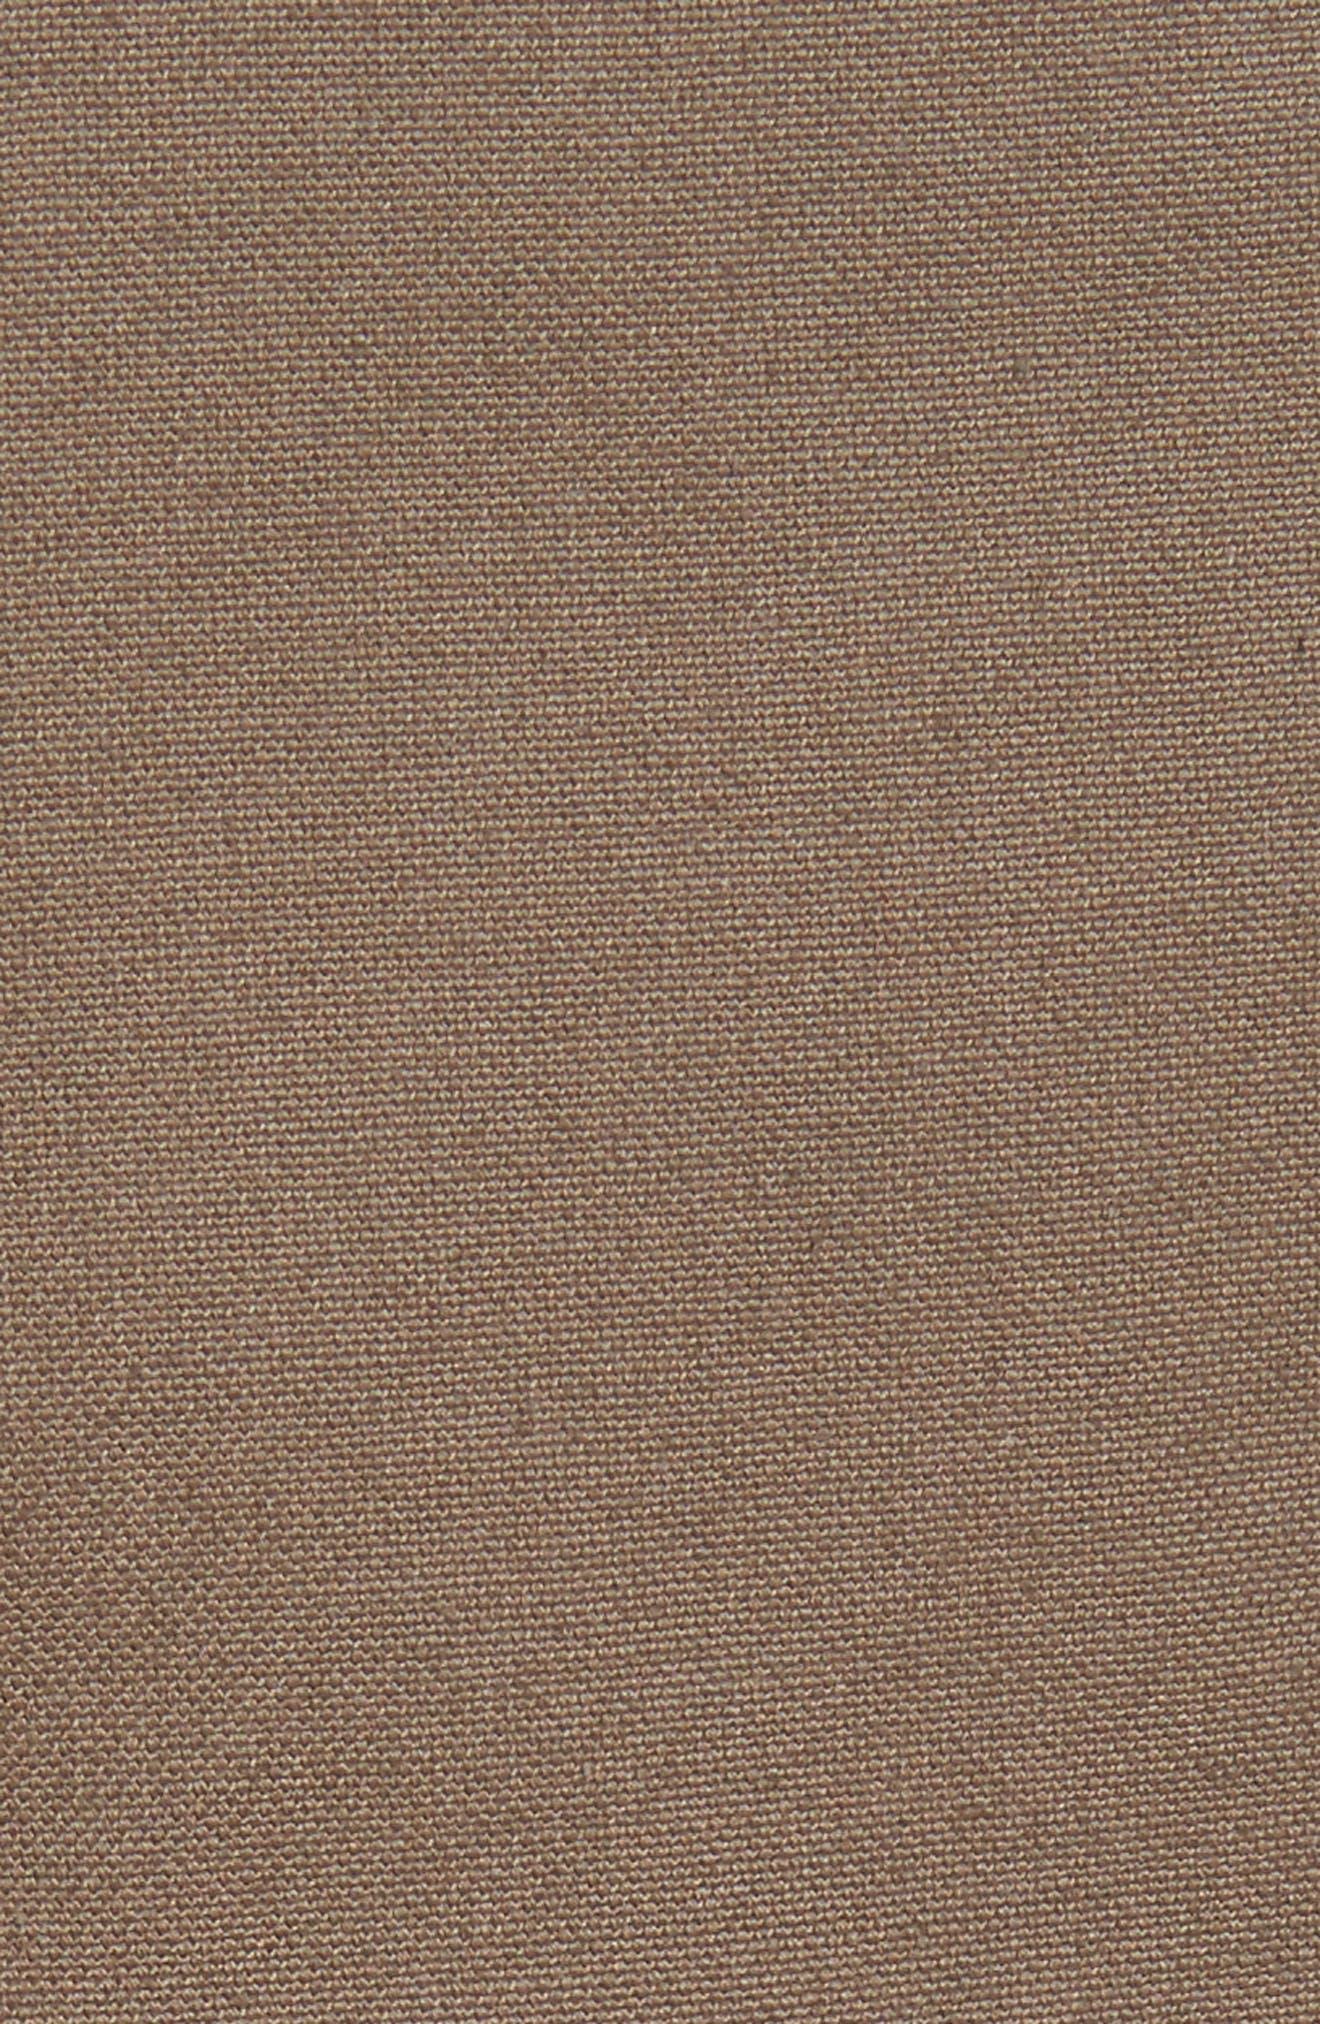 'VSM Gritter' Tapered Chinos,                             Alternate thumbnail 5, color,                             Beige